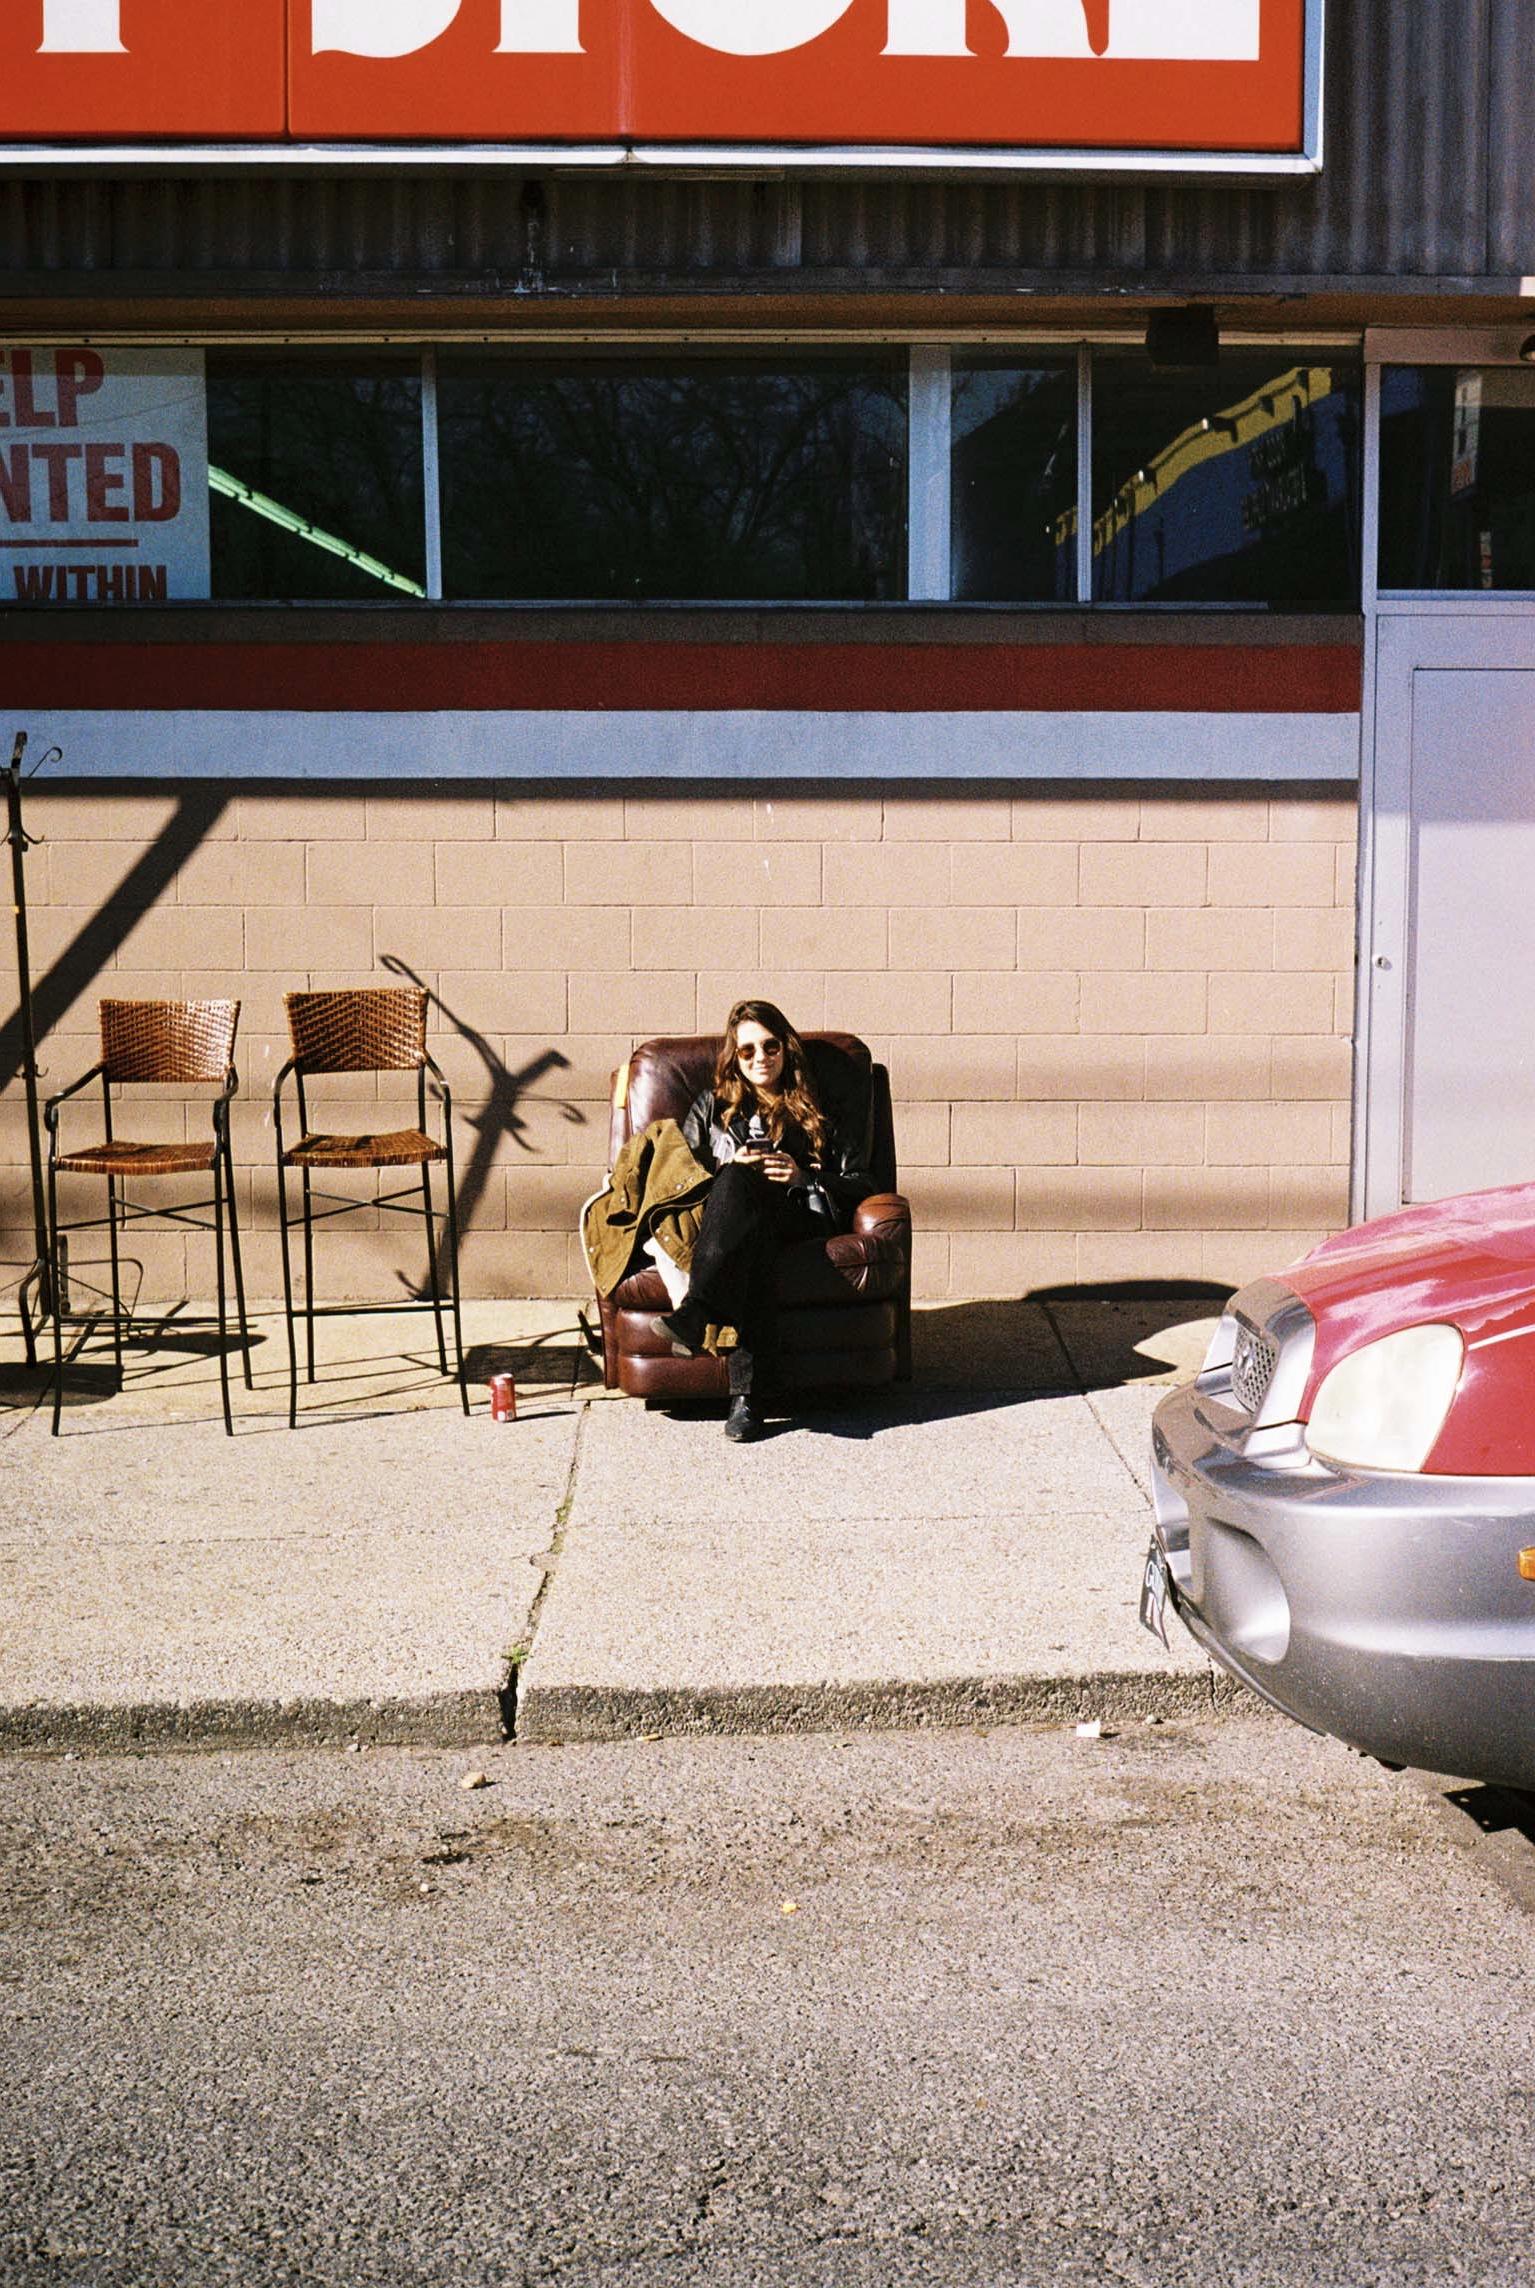 Out front of Southern Thrift Store.  Nashville, Tennessee.  Kodak Ultra Max 400. Pentax K1000. Fletcher Berryman 2019.